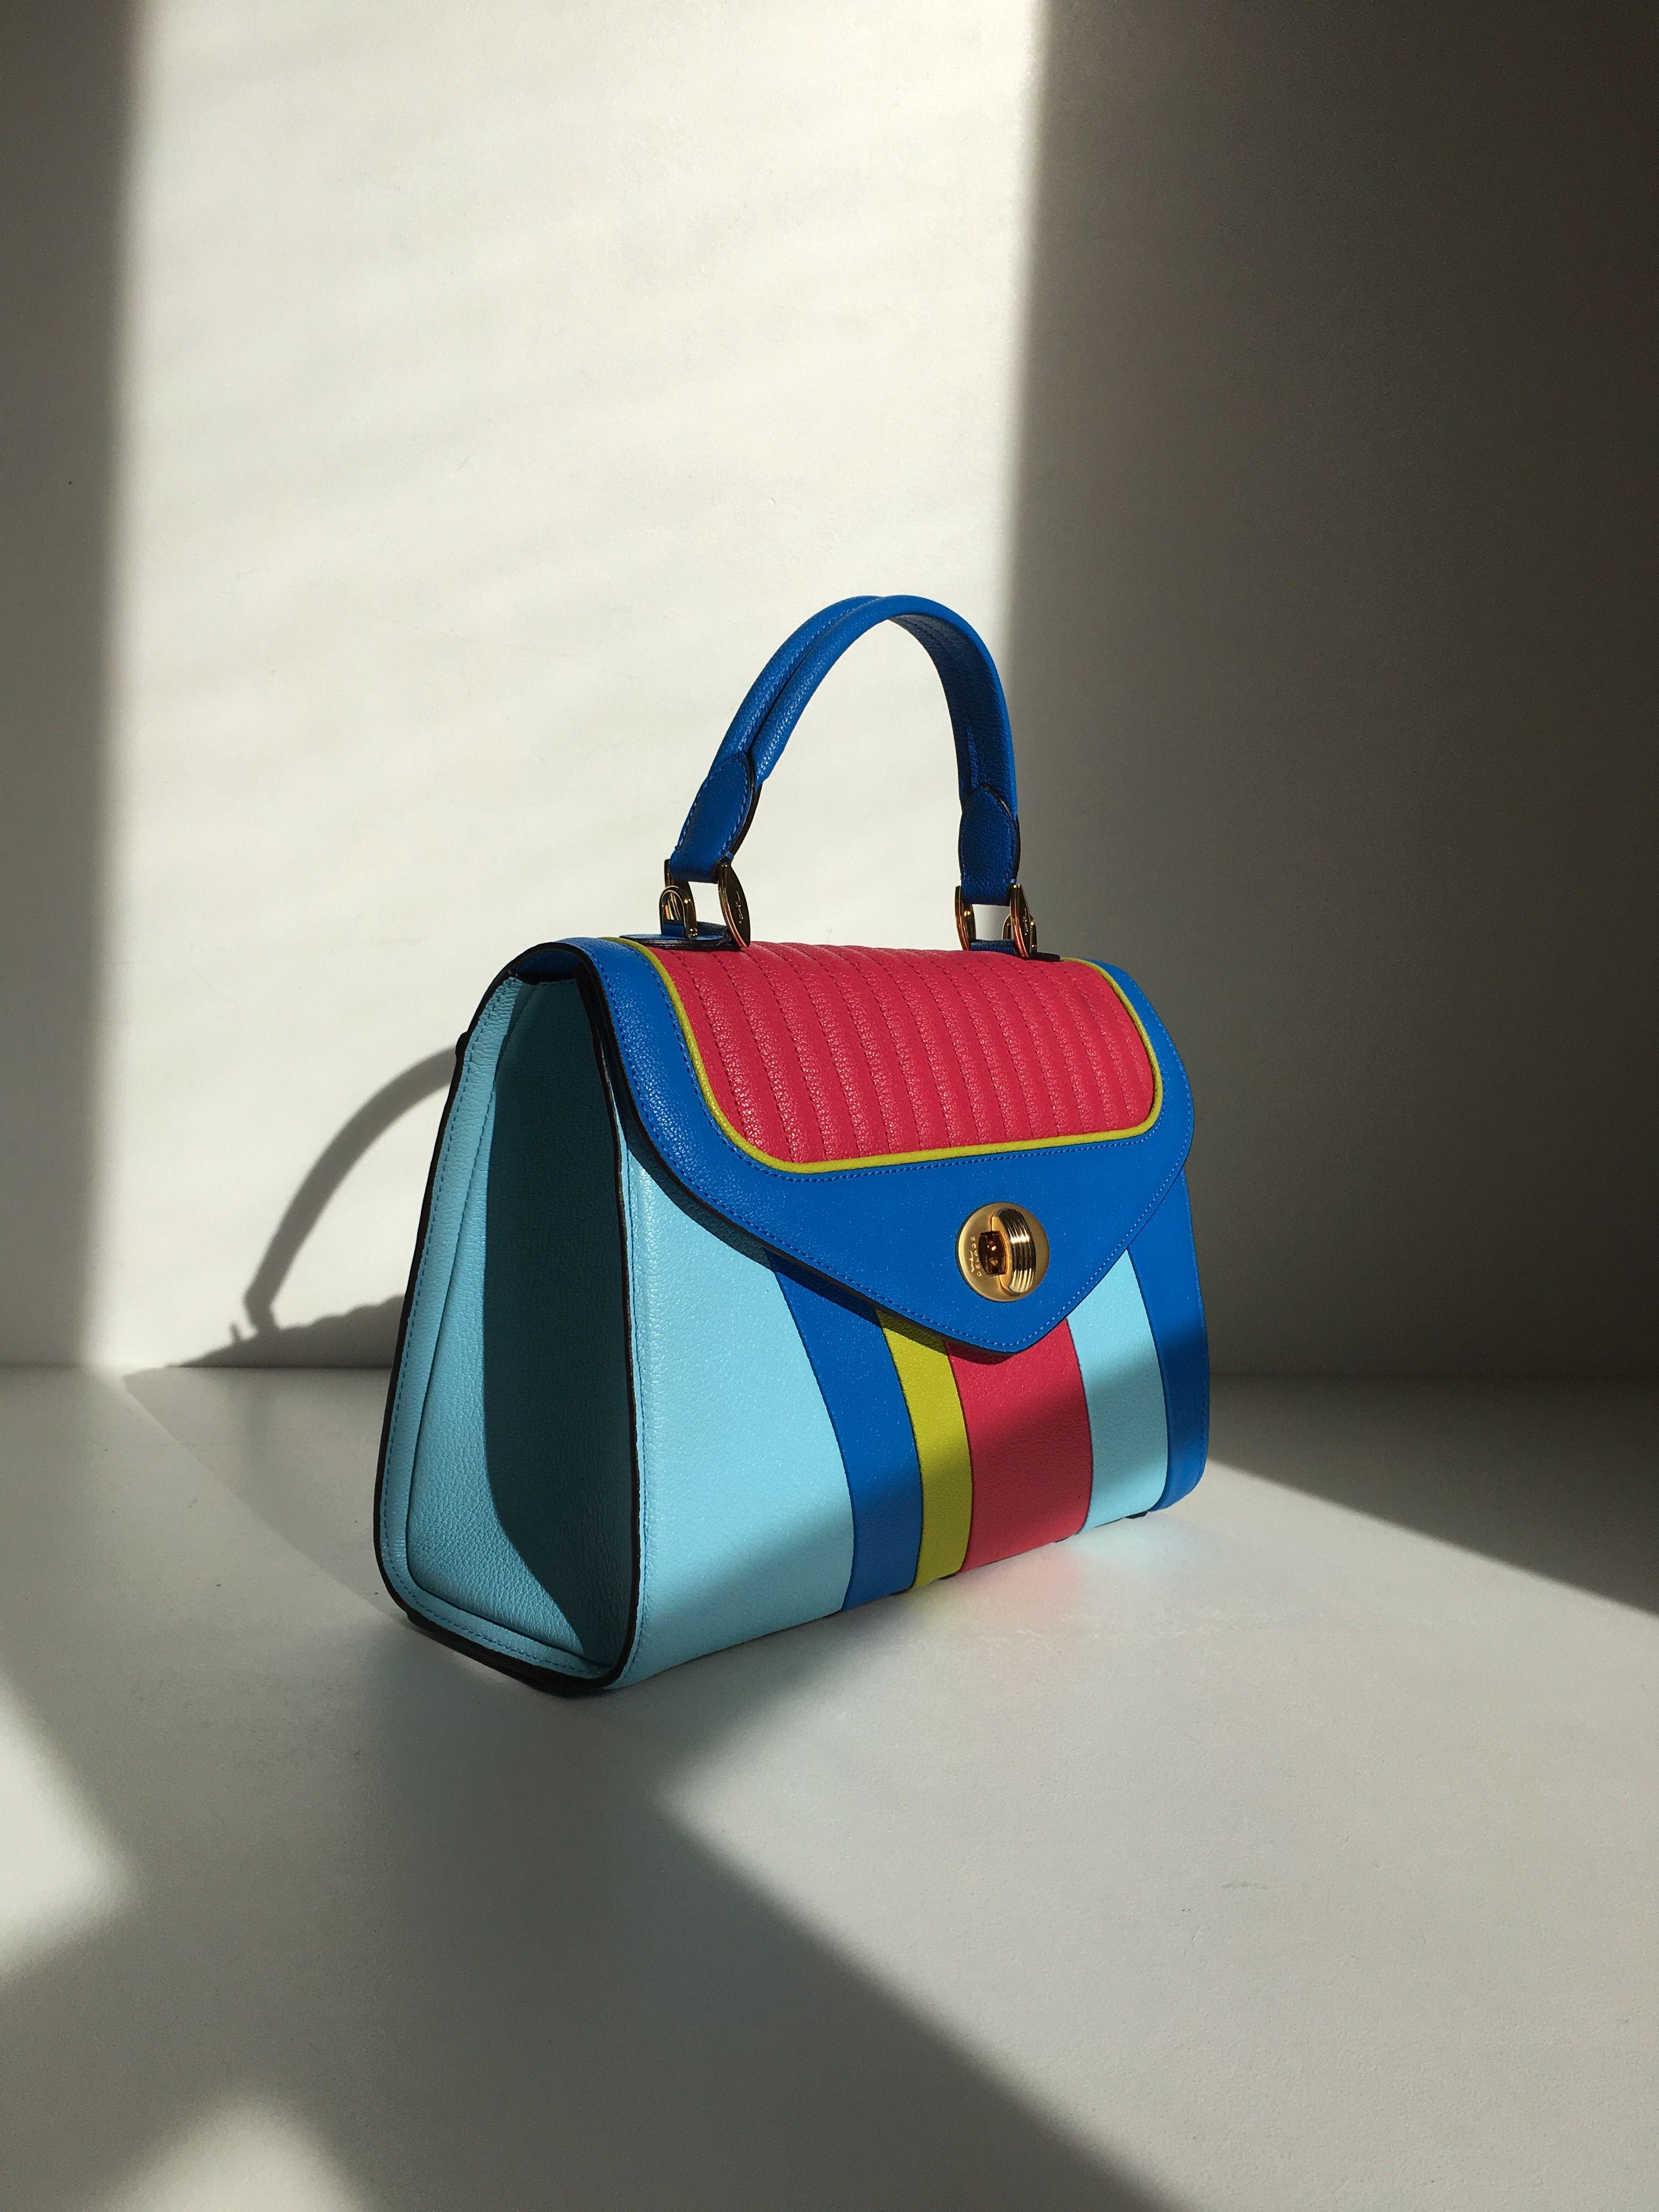 Freda Handbag Like A Rainbow Delage Paris Luxury